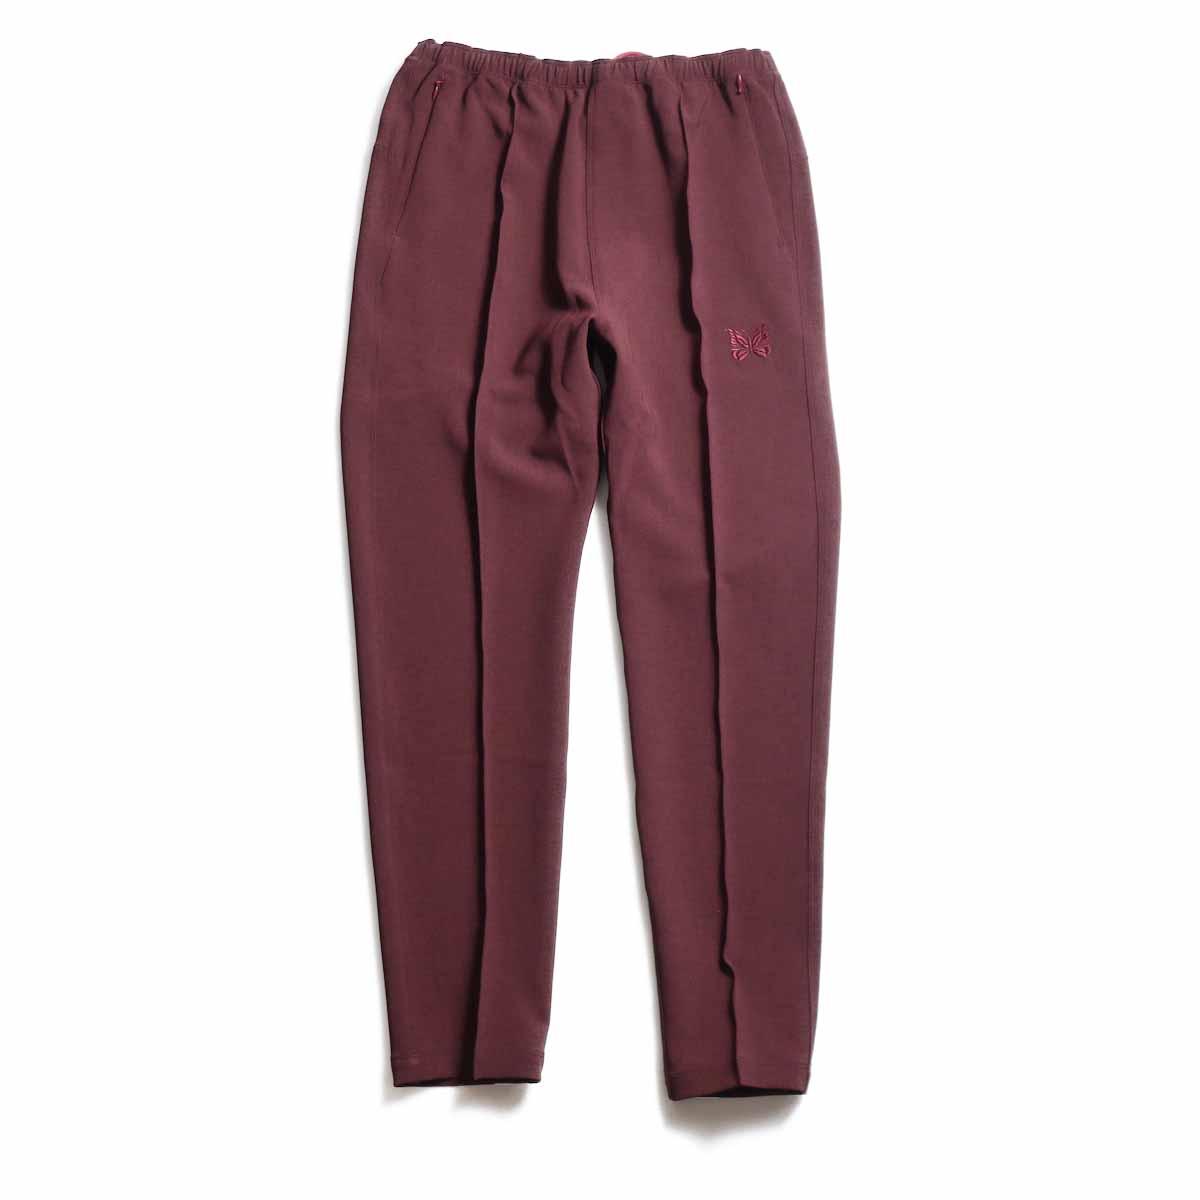 NEEDLES / Warm-Up Pant -Poly Double Cloth (Bordeaux)